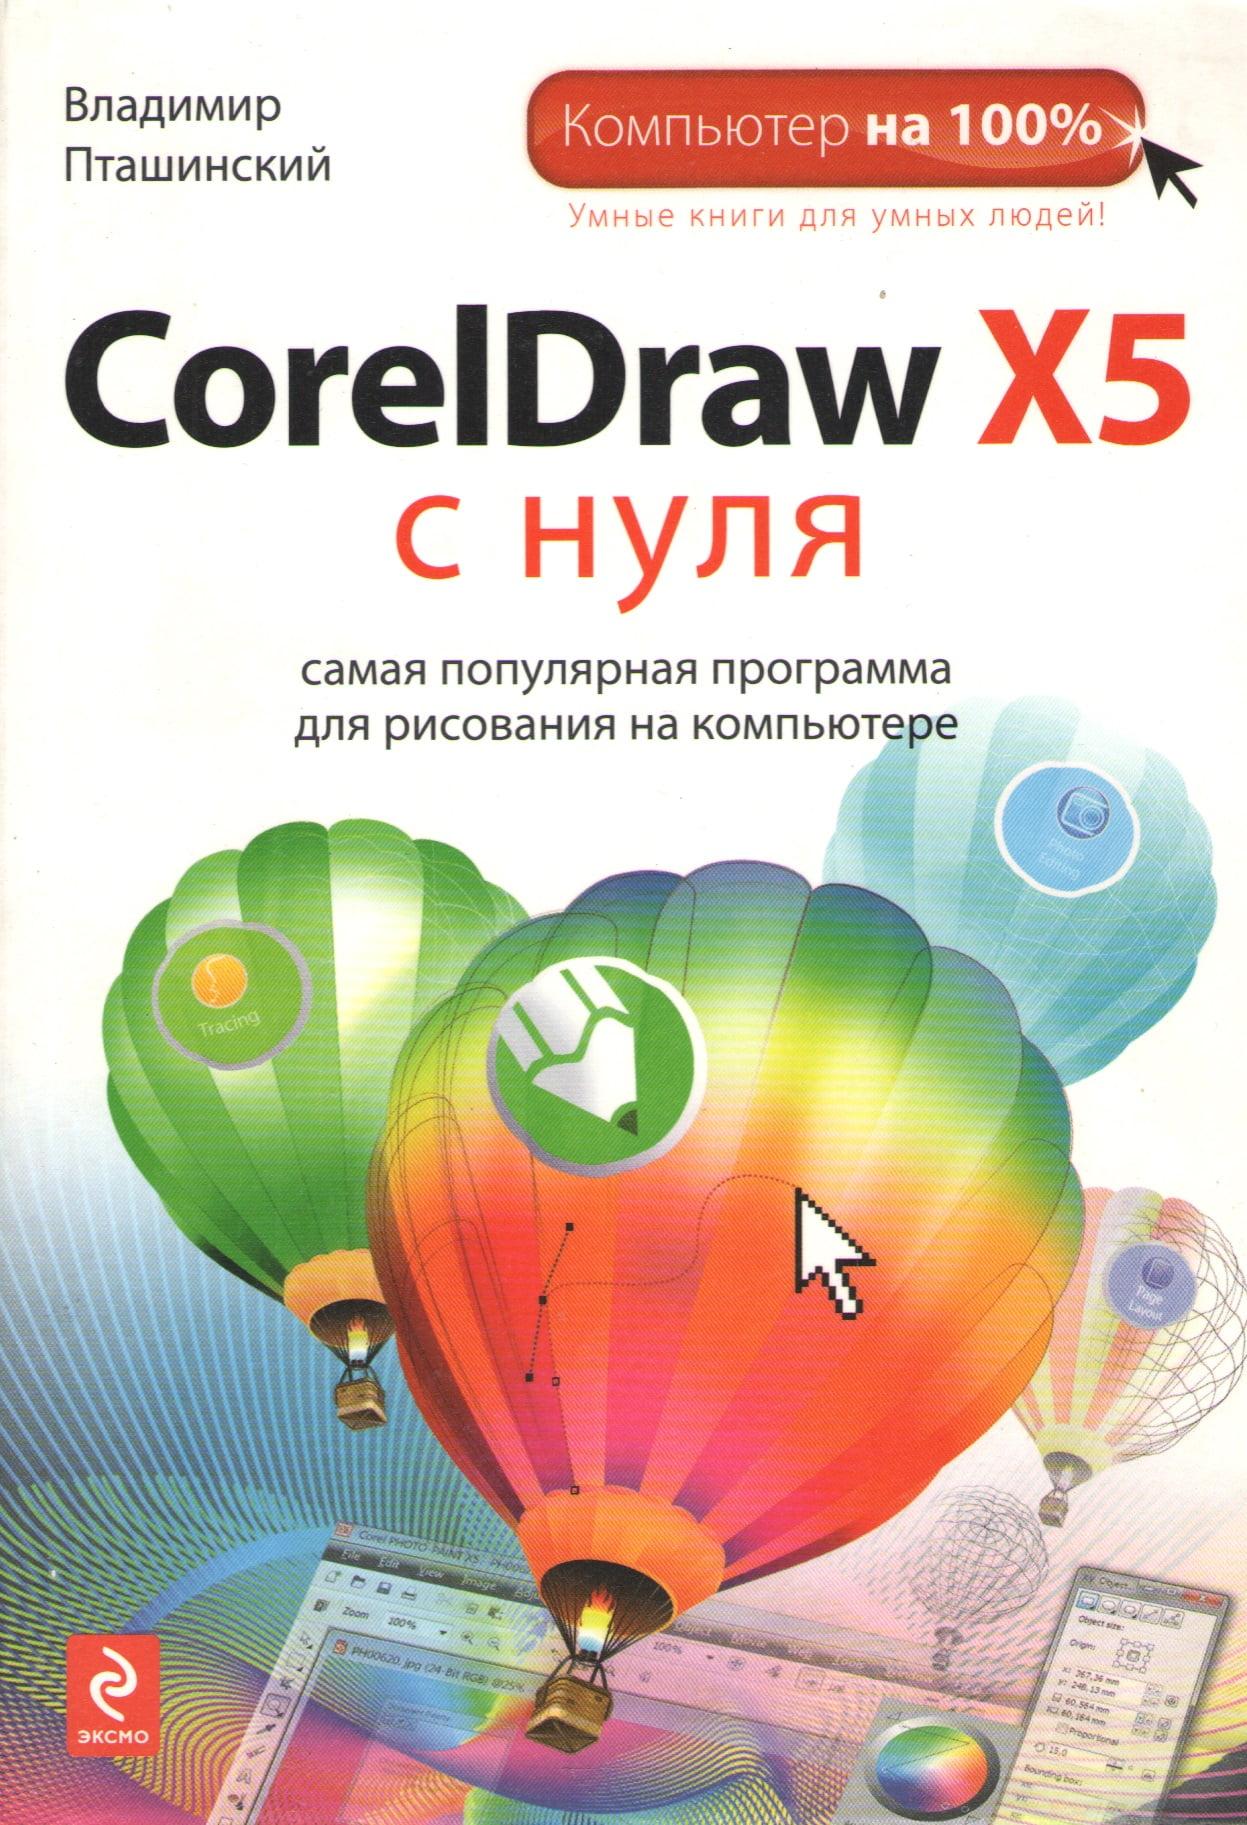 CorelDraw+X5+%D1%81+%D0%BD%D1%83%D0%BB%D1%8F - фото 1